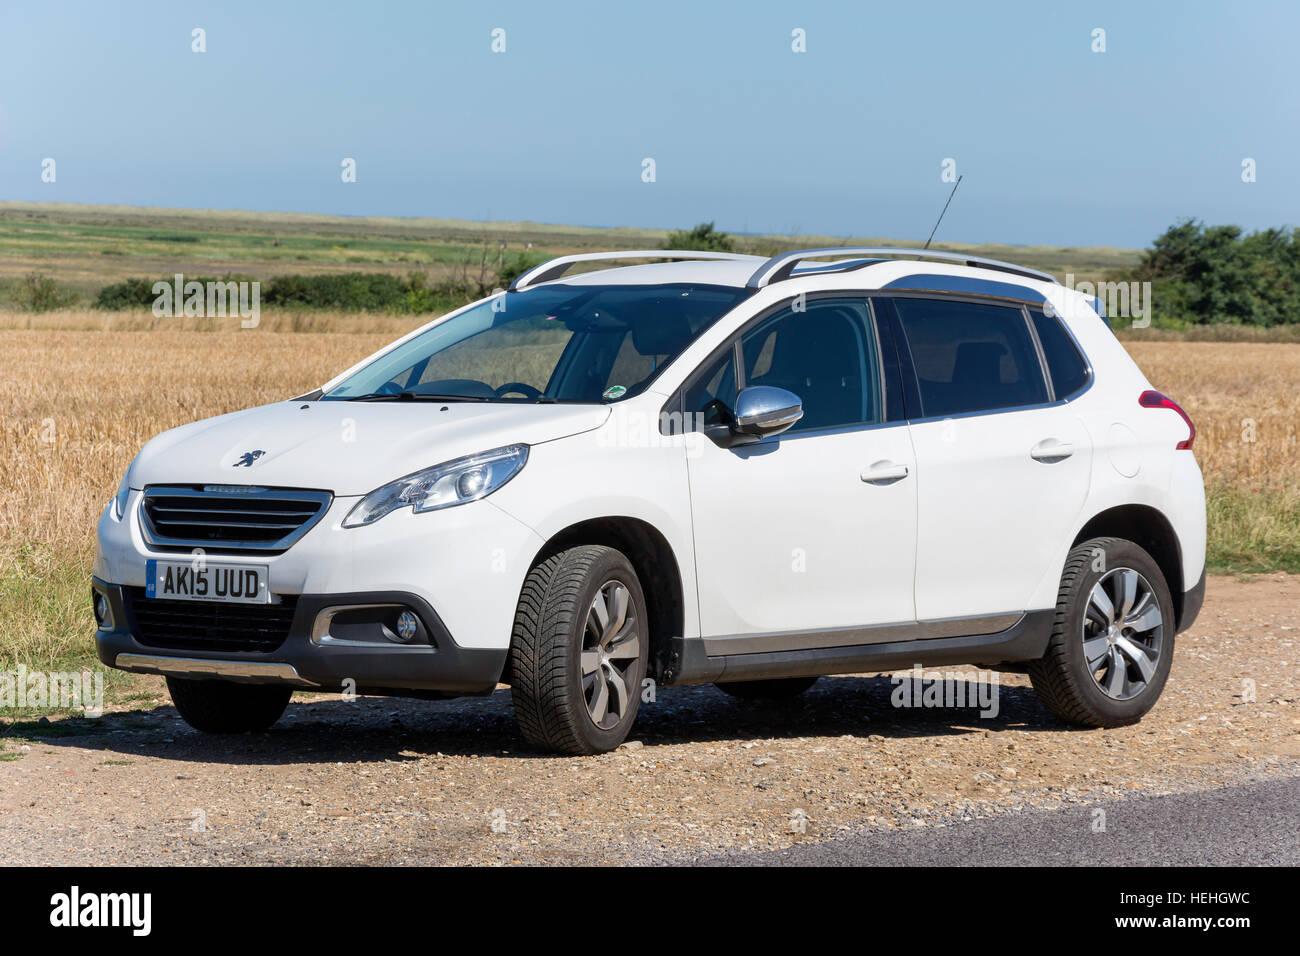 2015 Peugeot 2008 Crossover SUV, Burnham Overy Staithe, Norfolk, England, United Kingdom - Stock Image